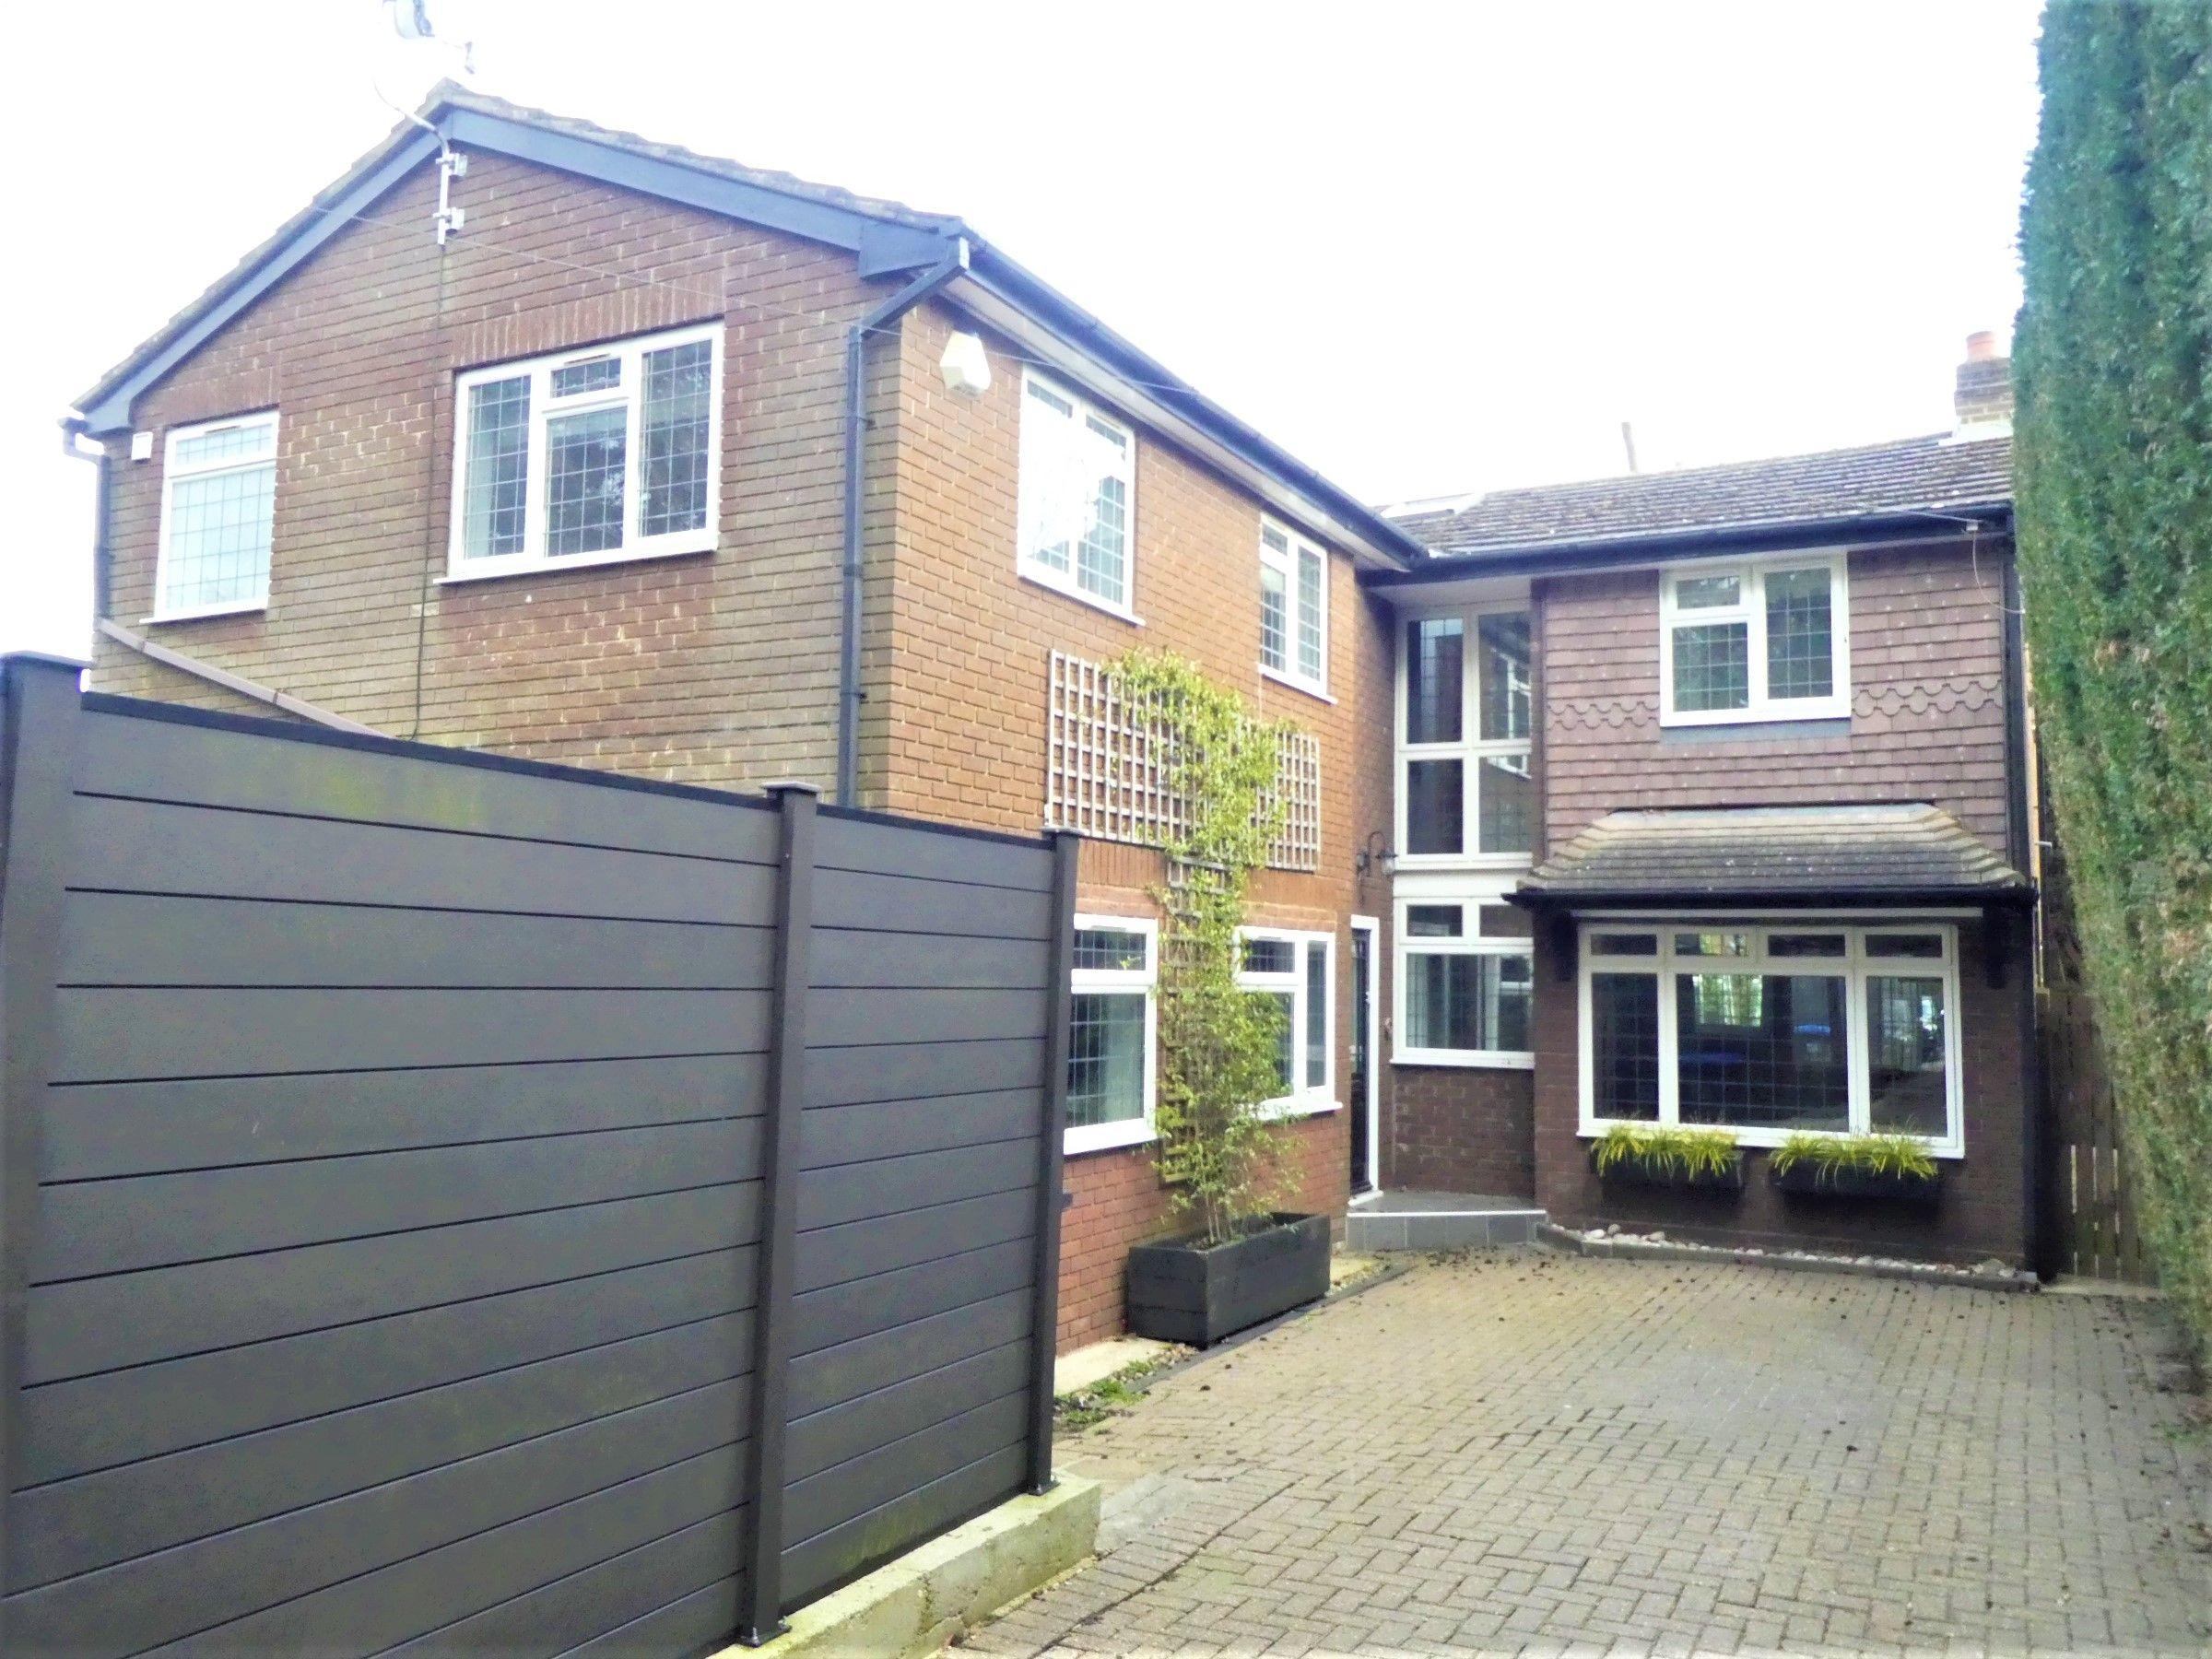 Property photo 1 of 28.